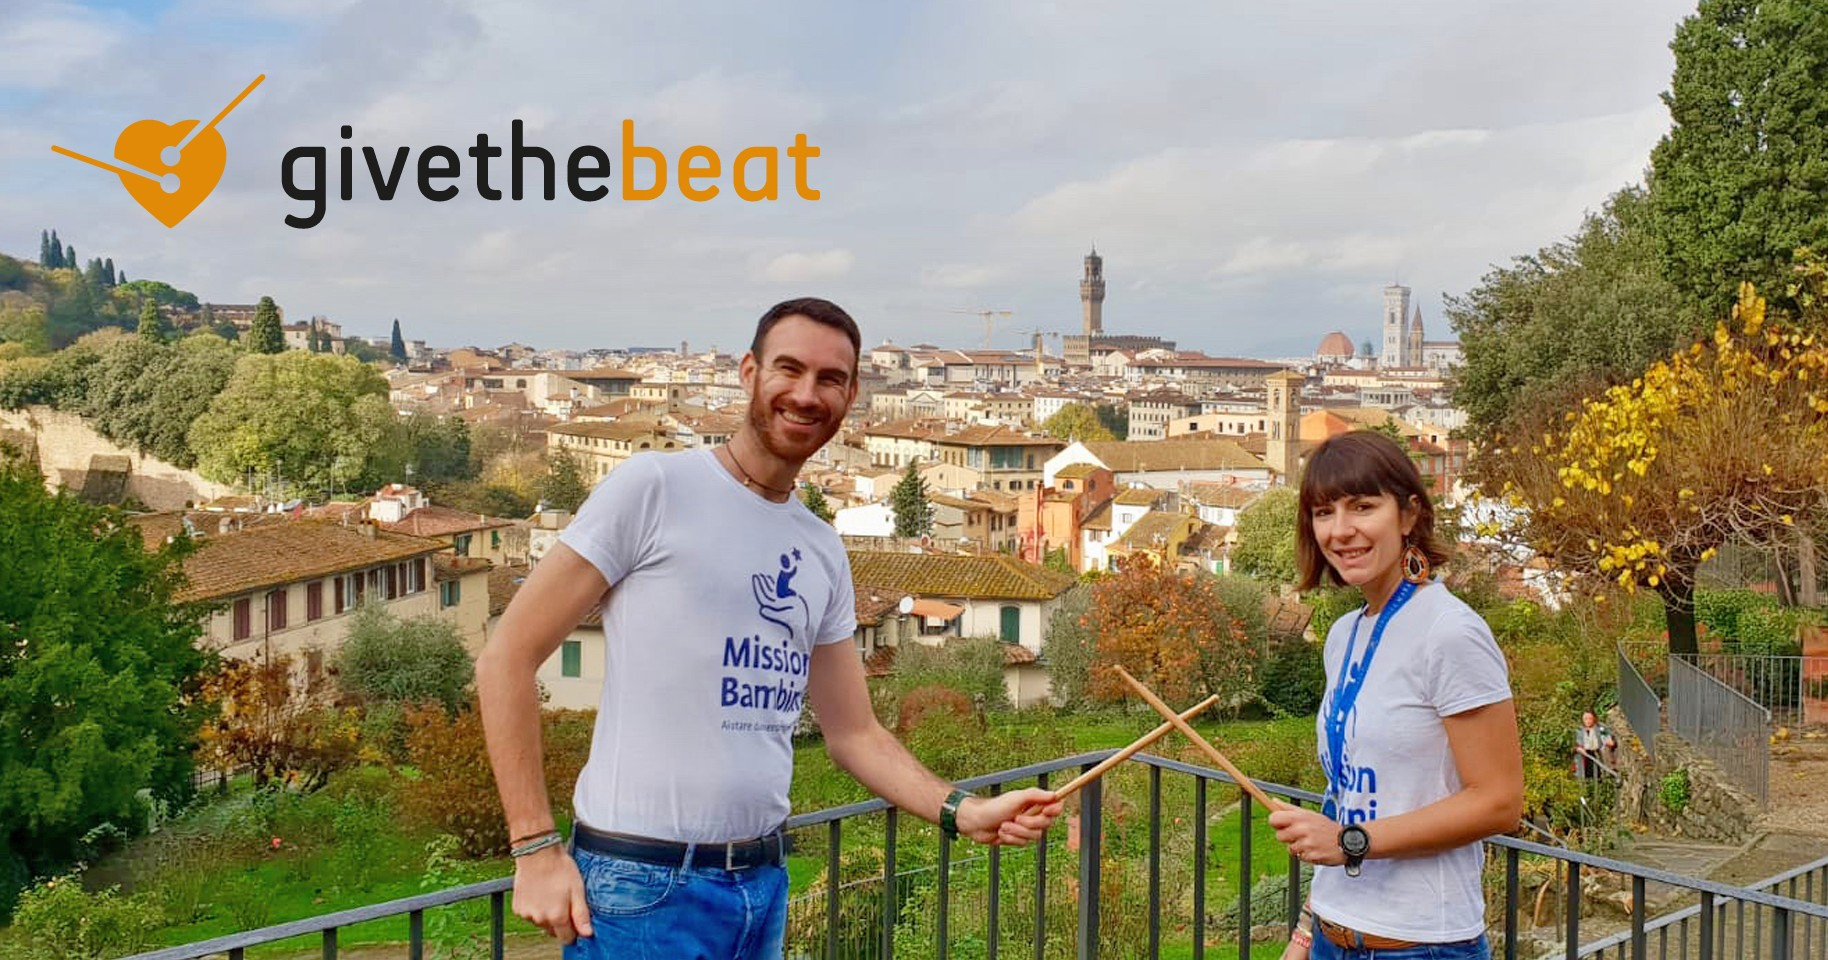 Road to #GivetheBeat -Giorgia Bottacchi